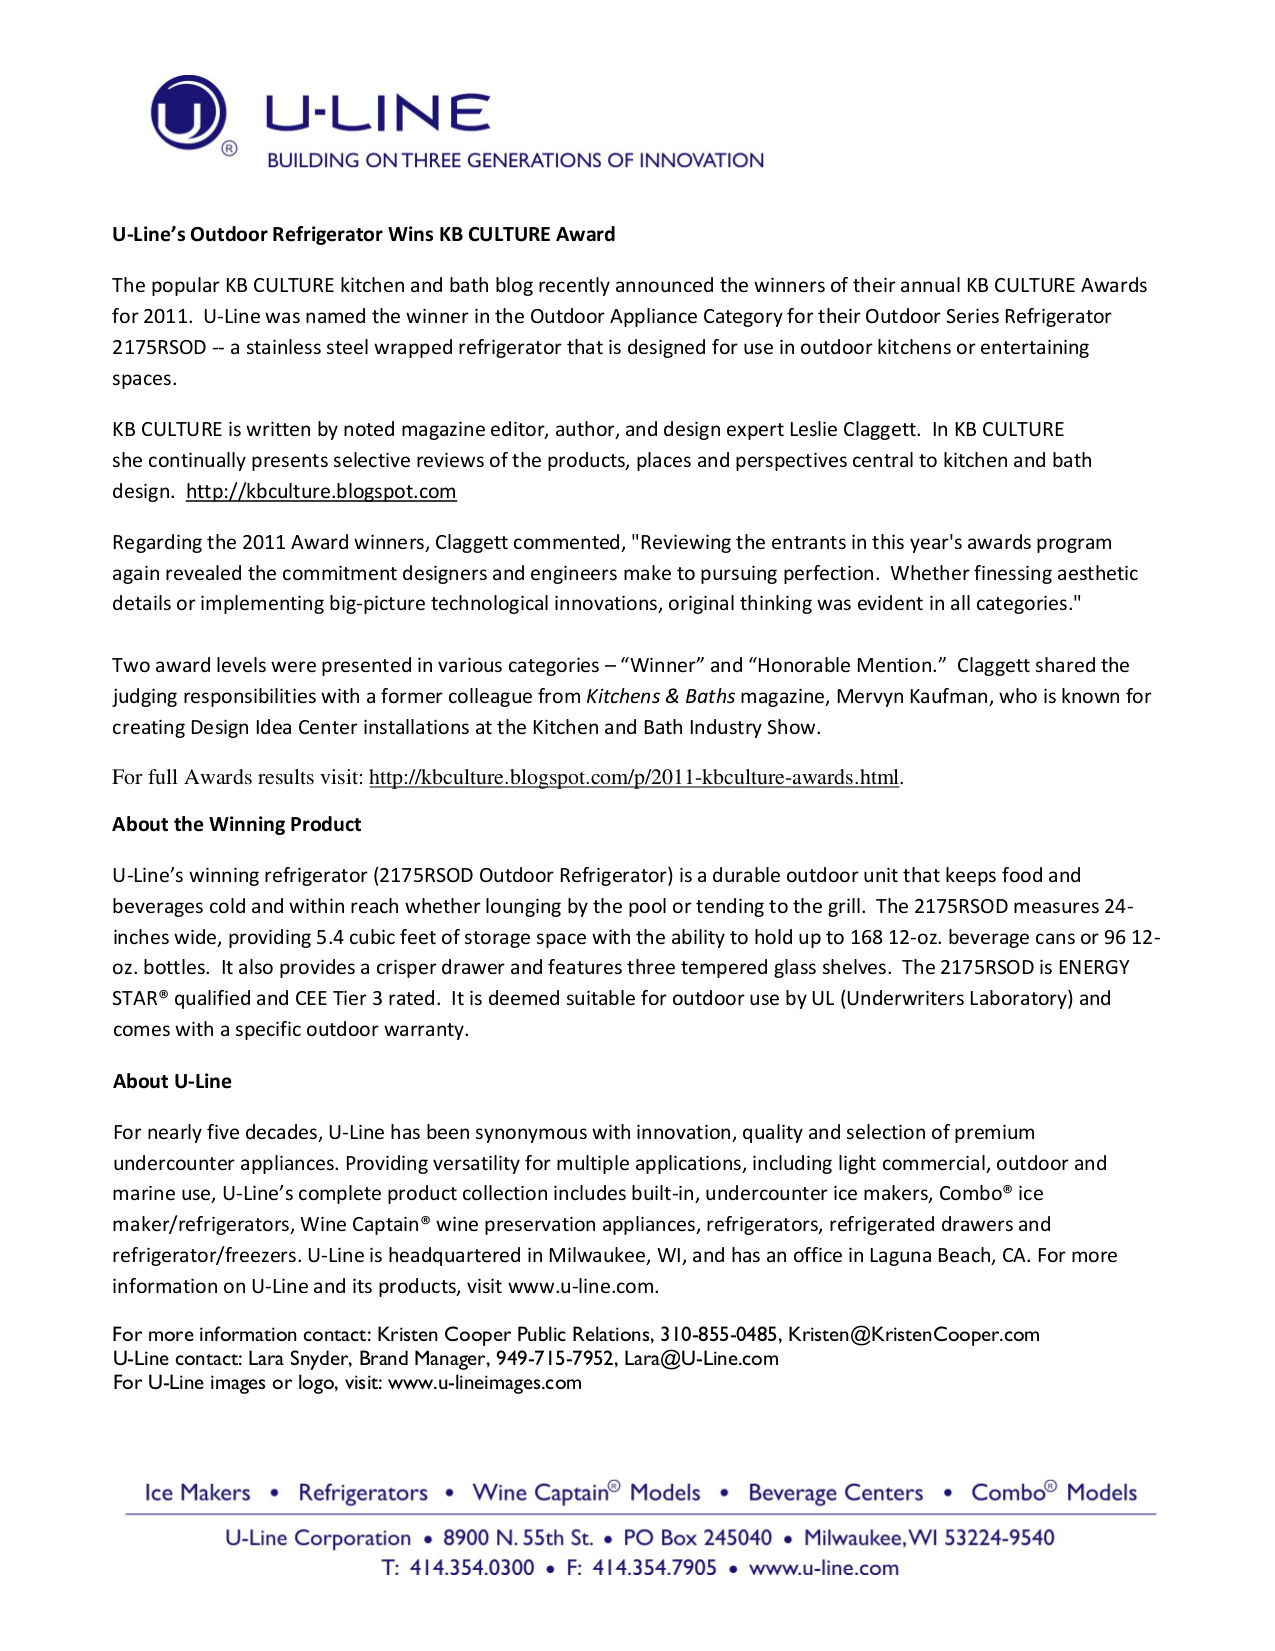 pdf for U-Line Refrigerator 2175RSOD manual